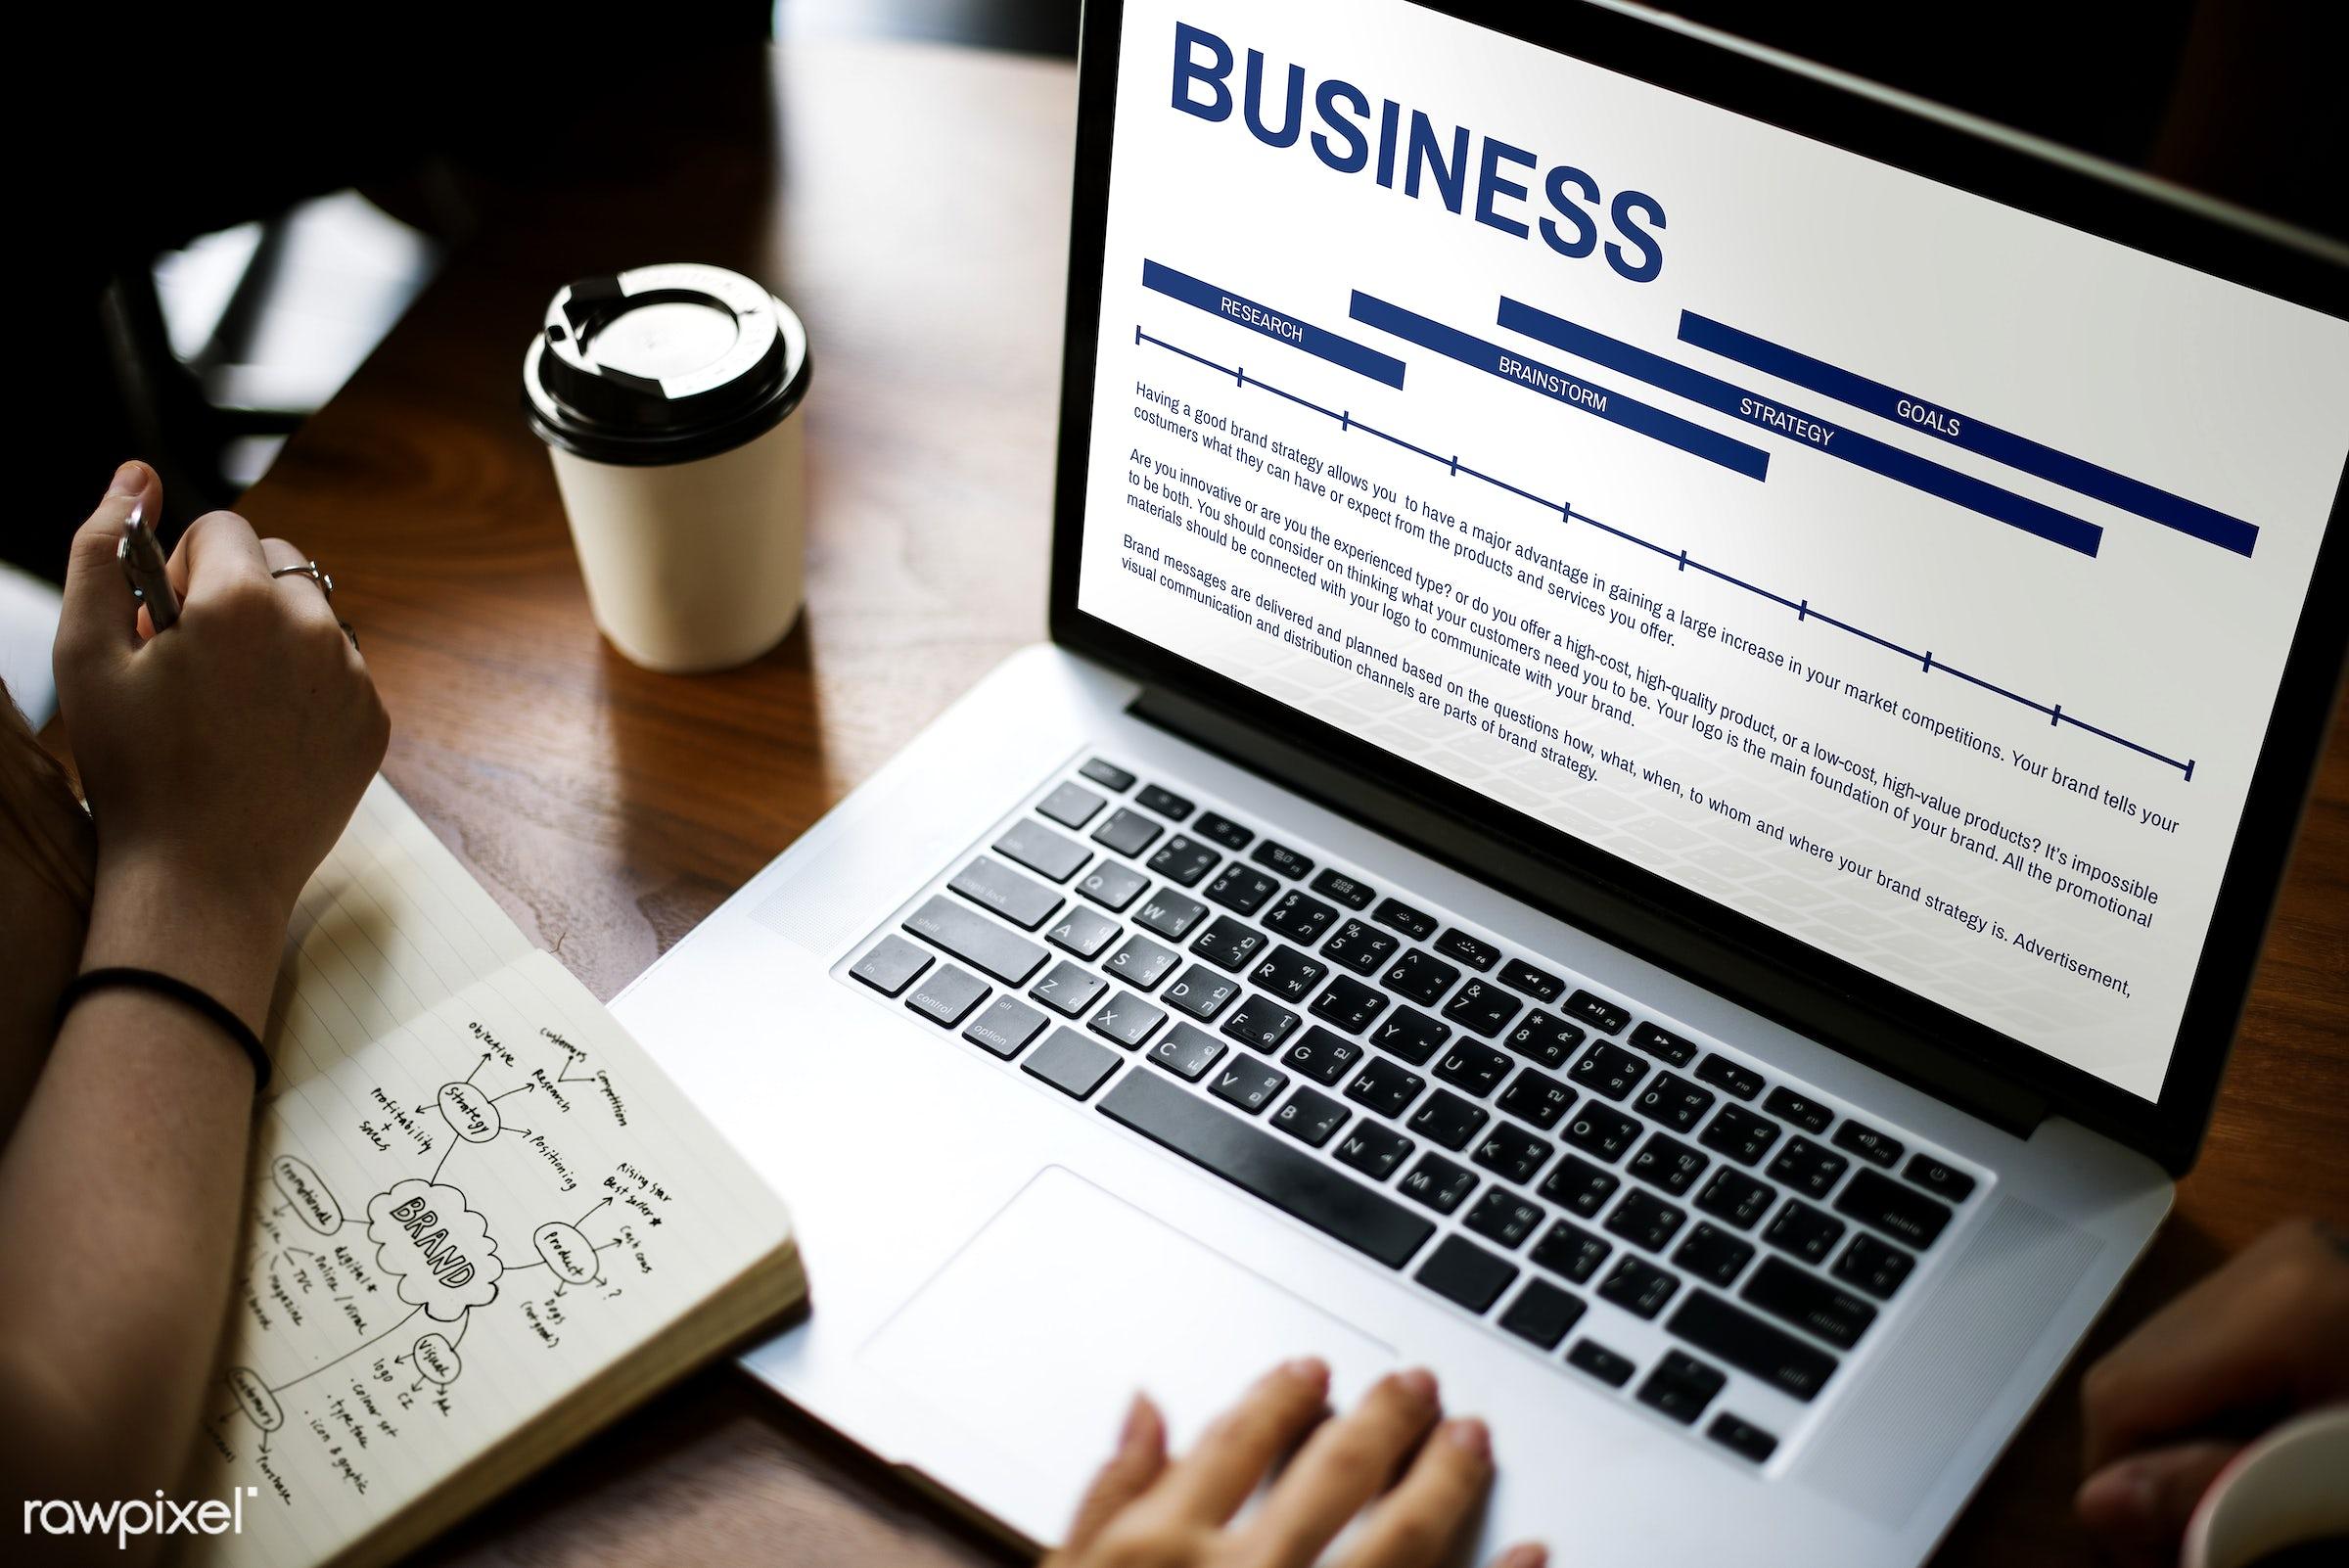 advertising, brainstorm, brand, branding, browsing, business, coffee cup, creation, creative, creativity, design, device,...